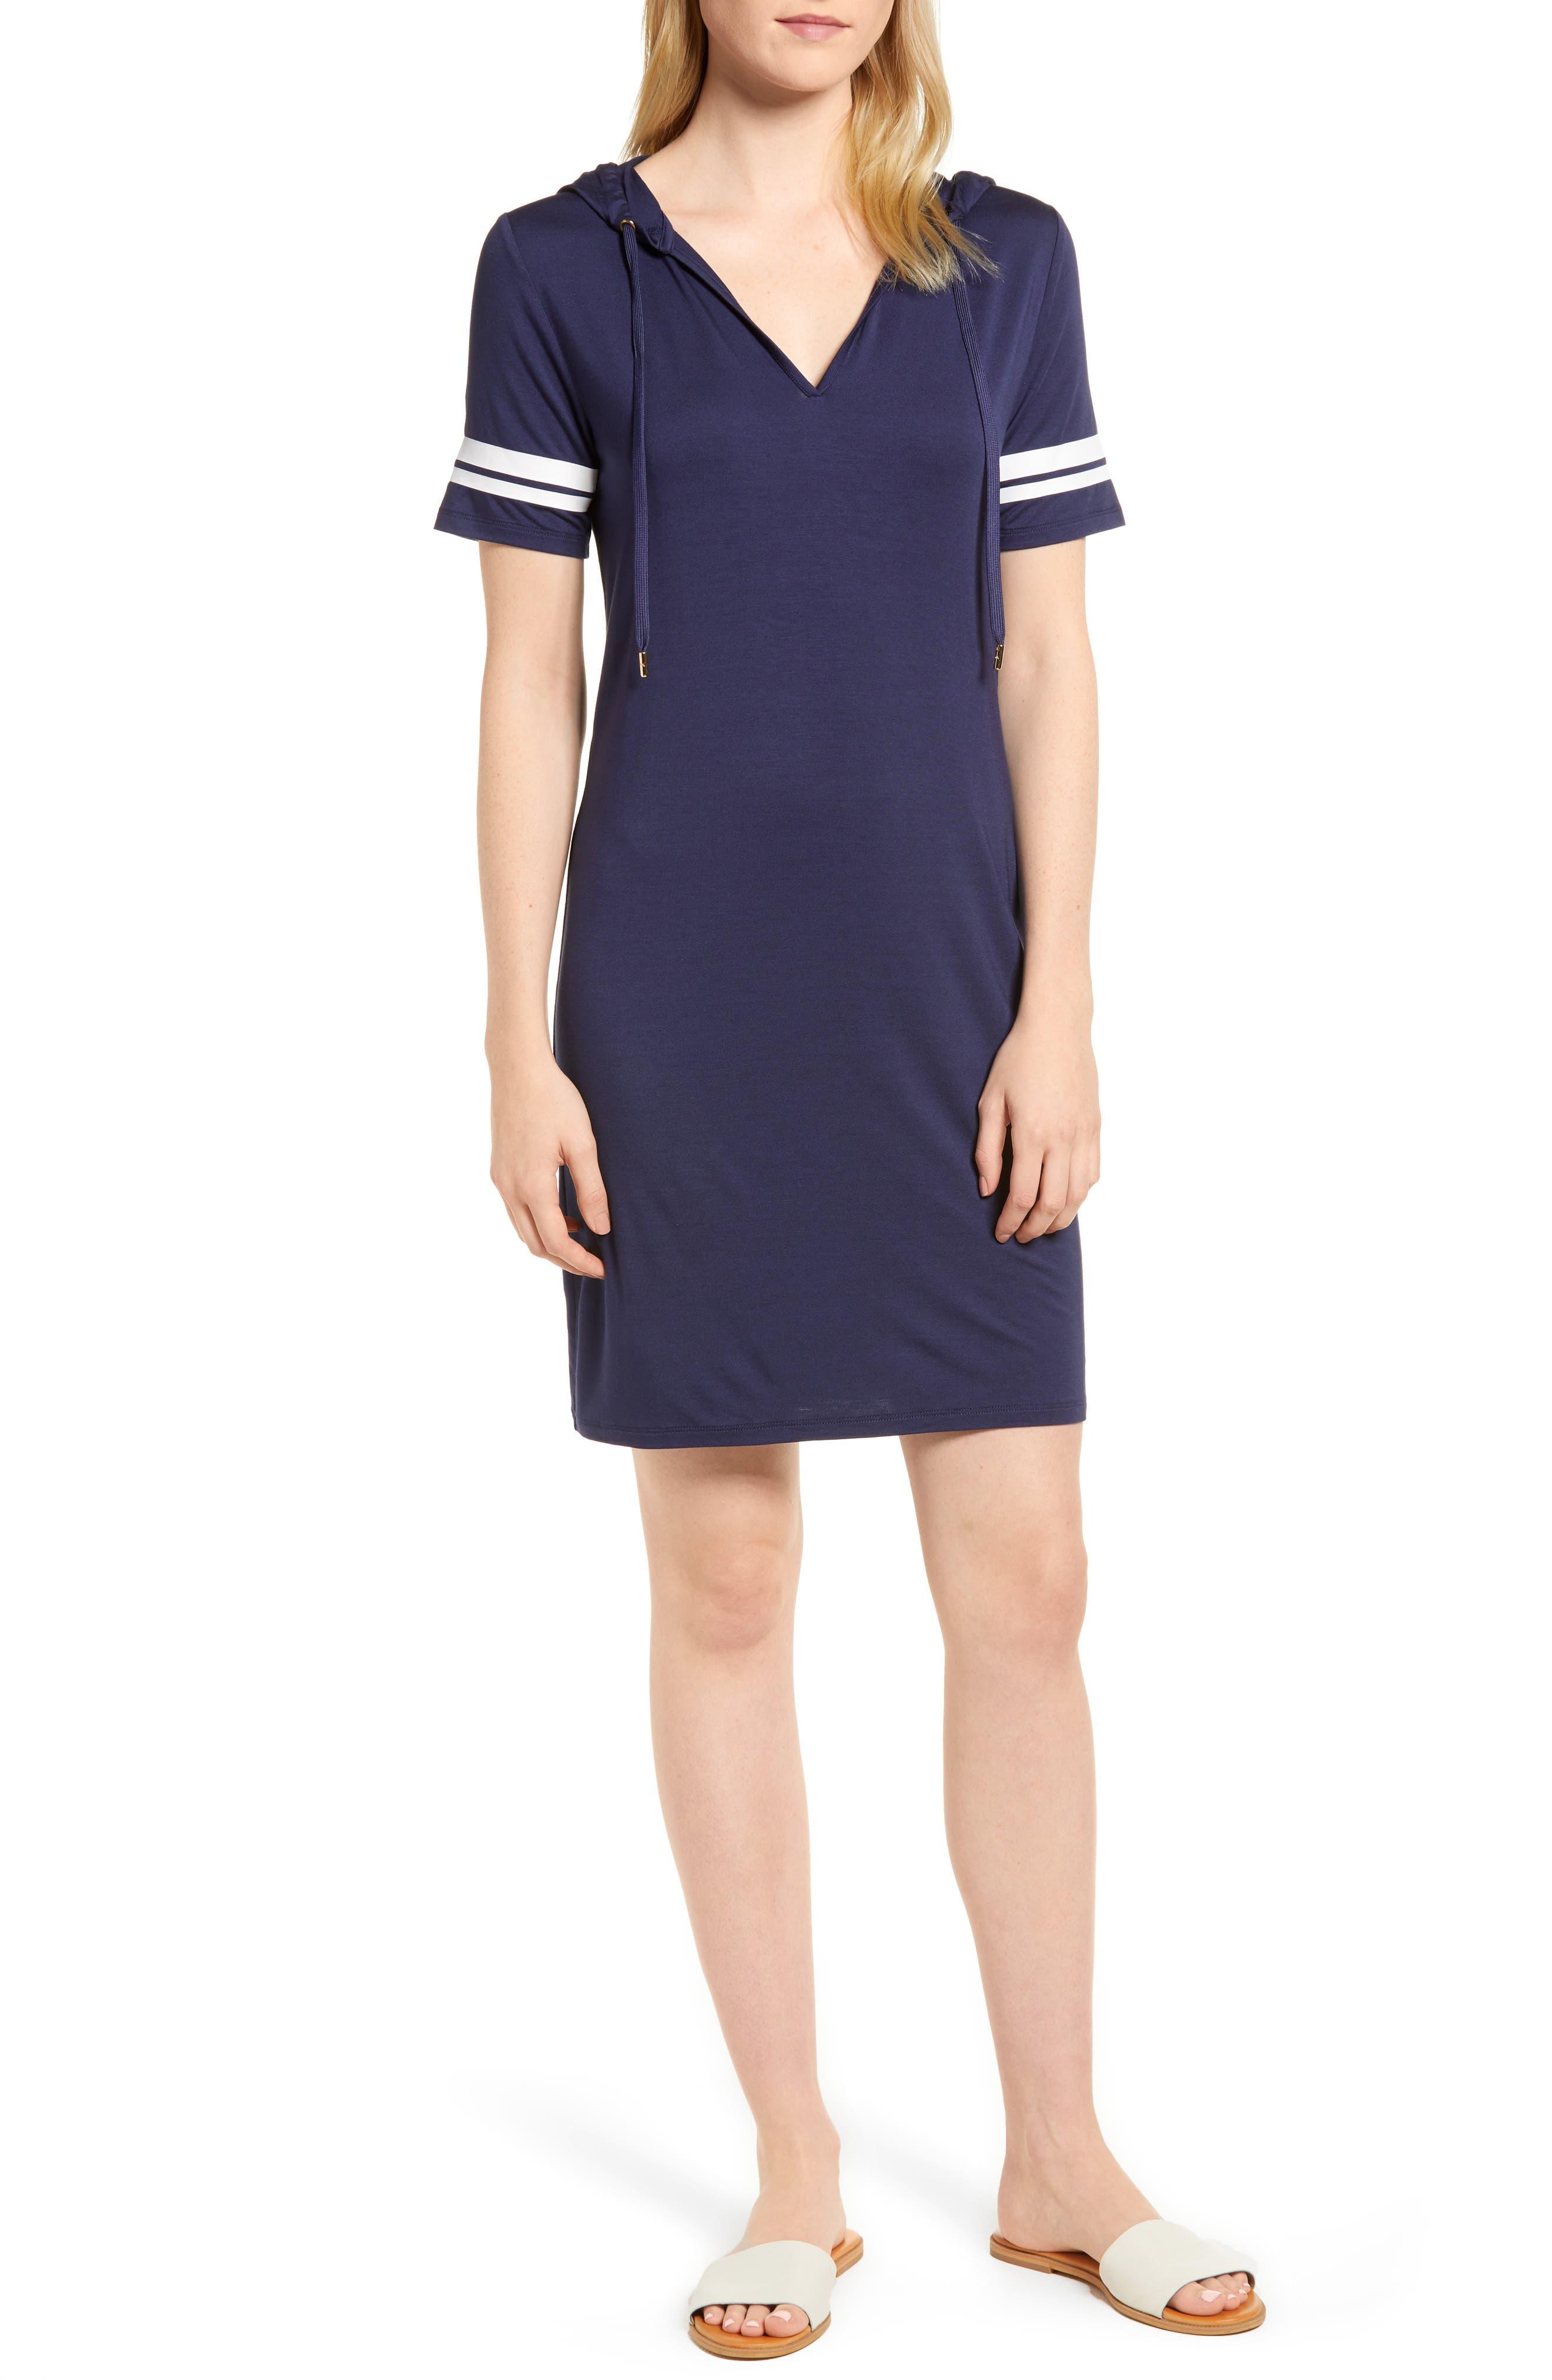 MICHAEL Michal Kors Stripe Sleeve Hoodie Dress,                             Main thumbnail 2, color,